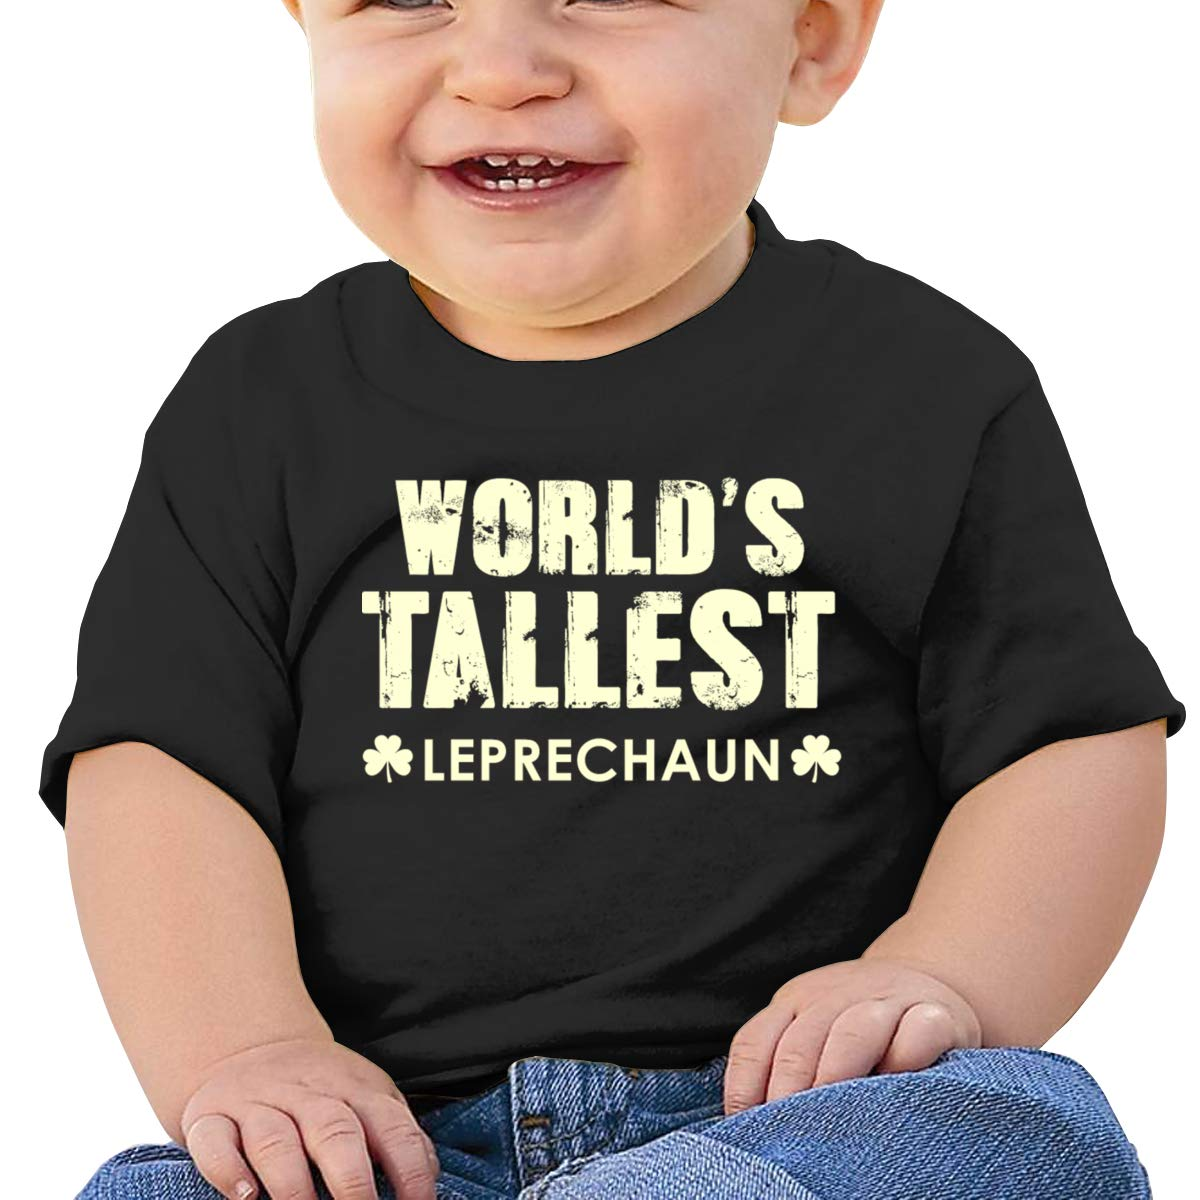 Patricks Day Short-Sleeves Tshirt Baby Boys Qiop Nee Tallest Leprechaun St